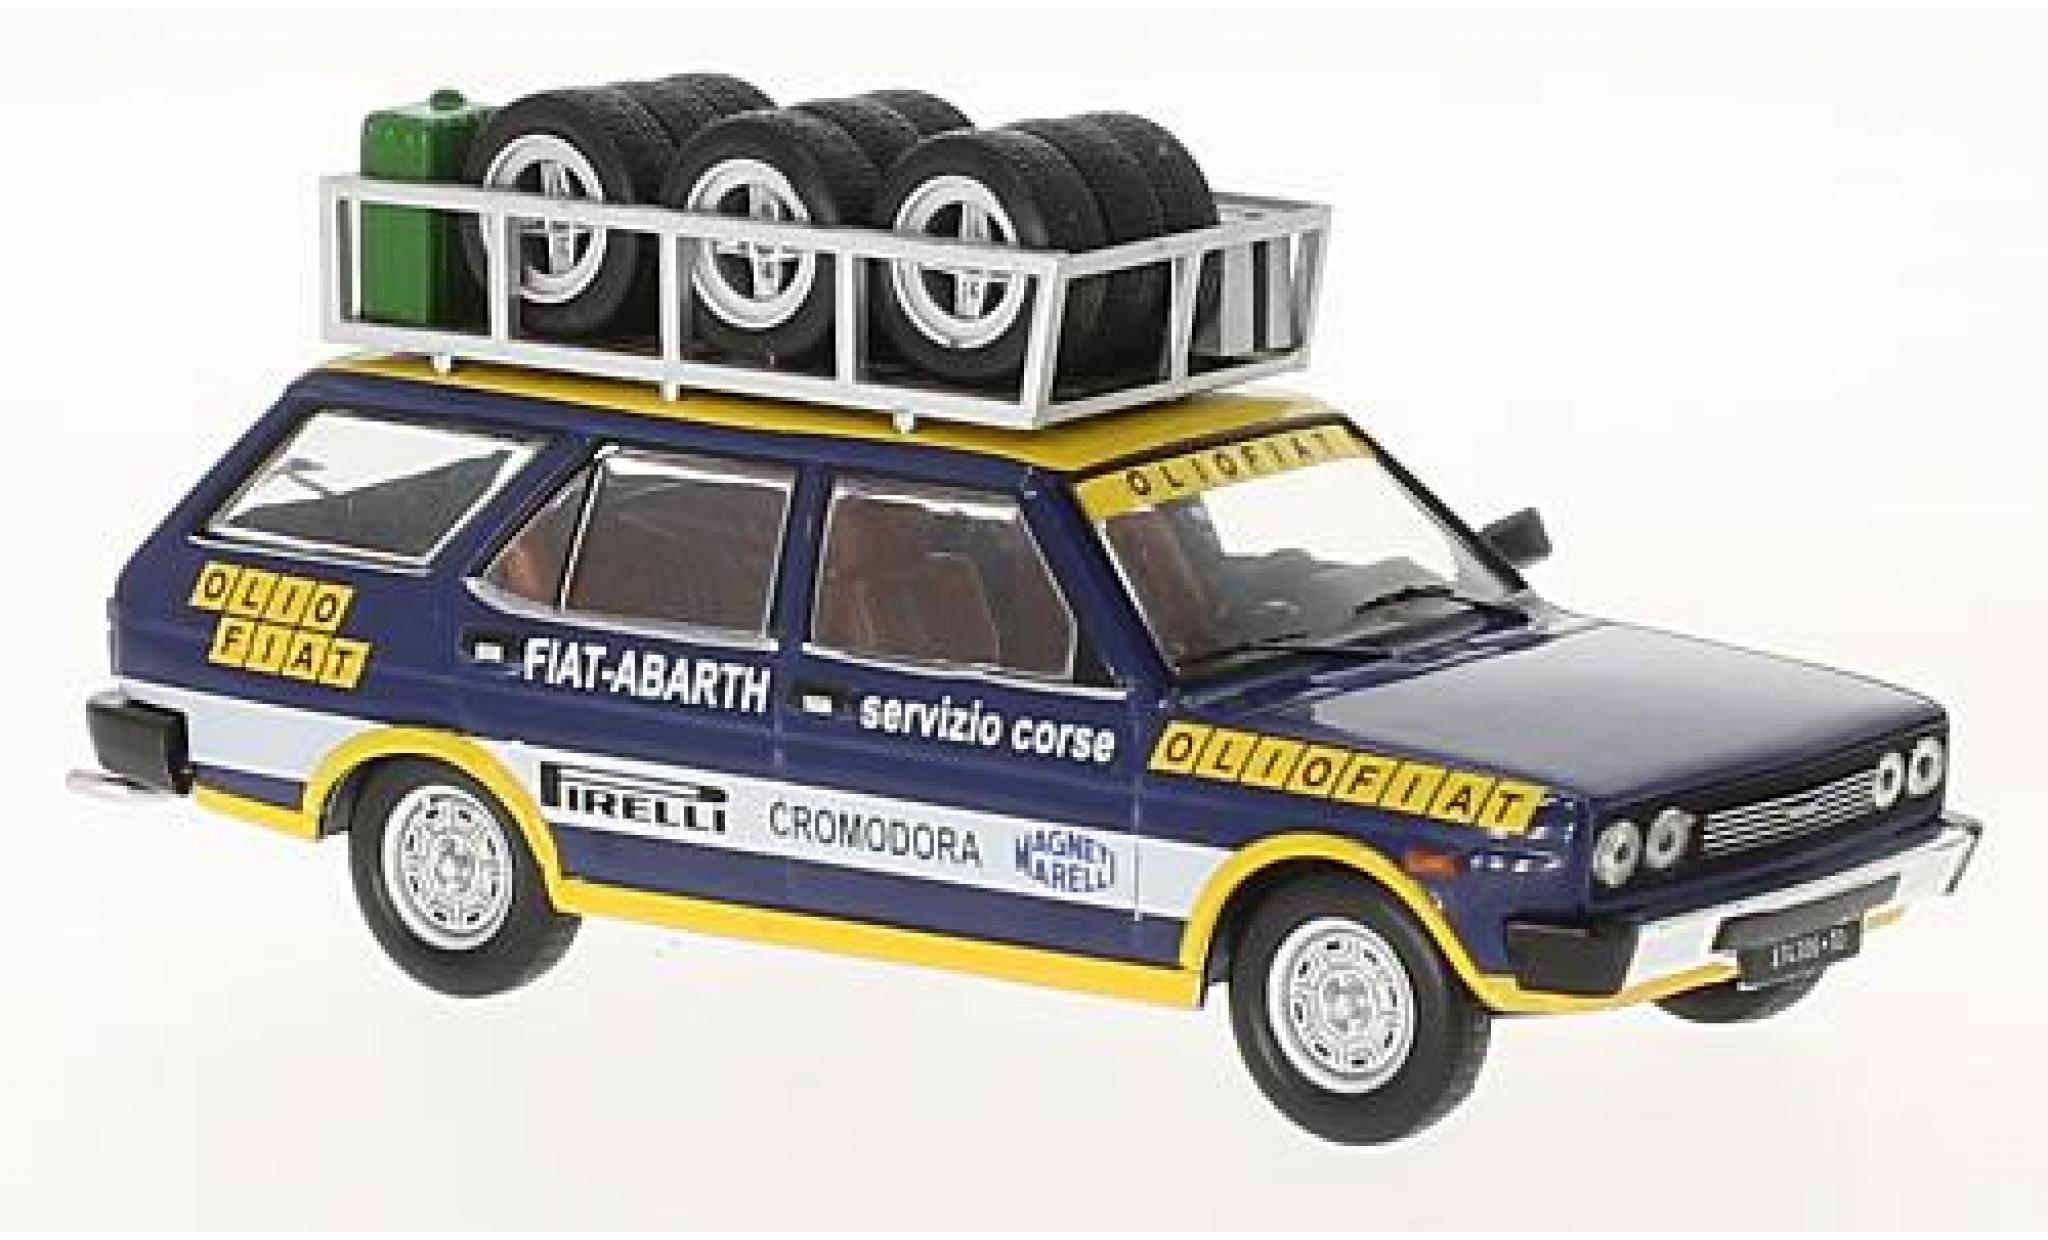 Fiat 131 1/43 IXO Panorama Olio Flat 1975 Rallye Assistance